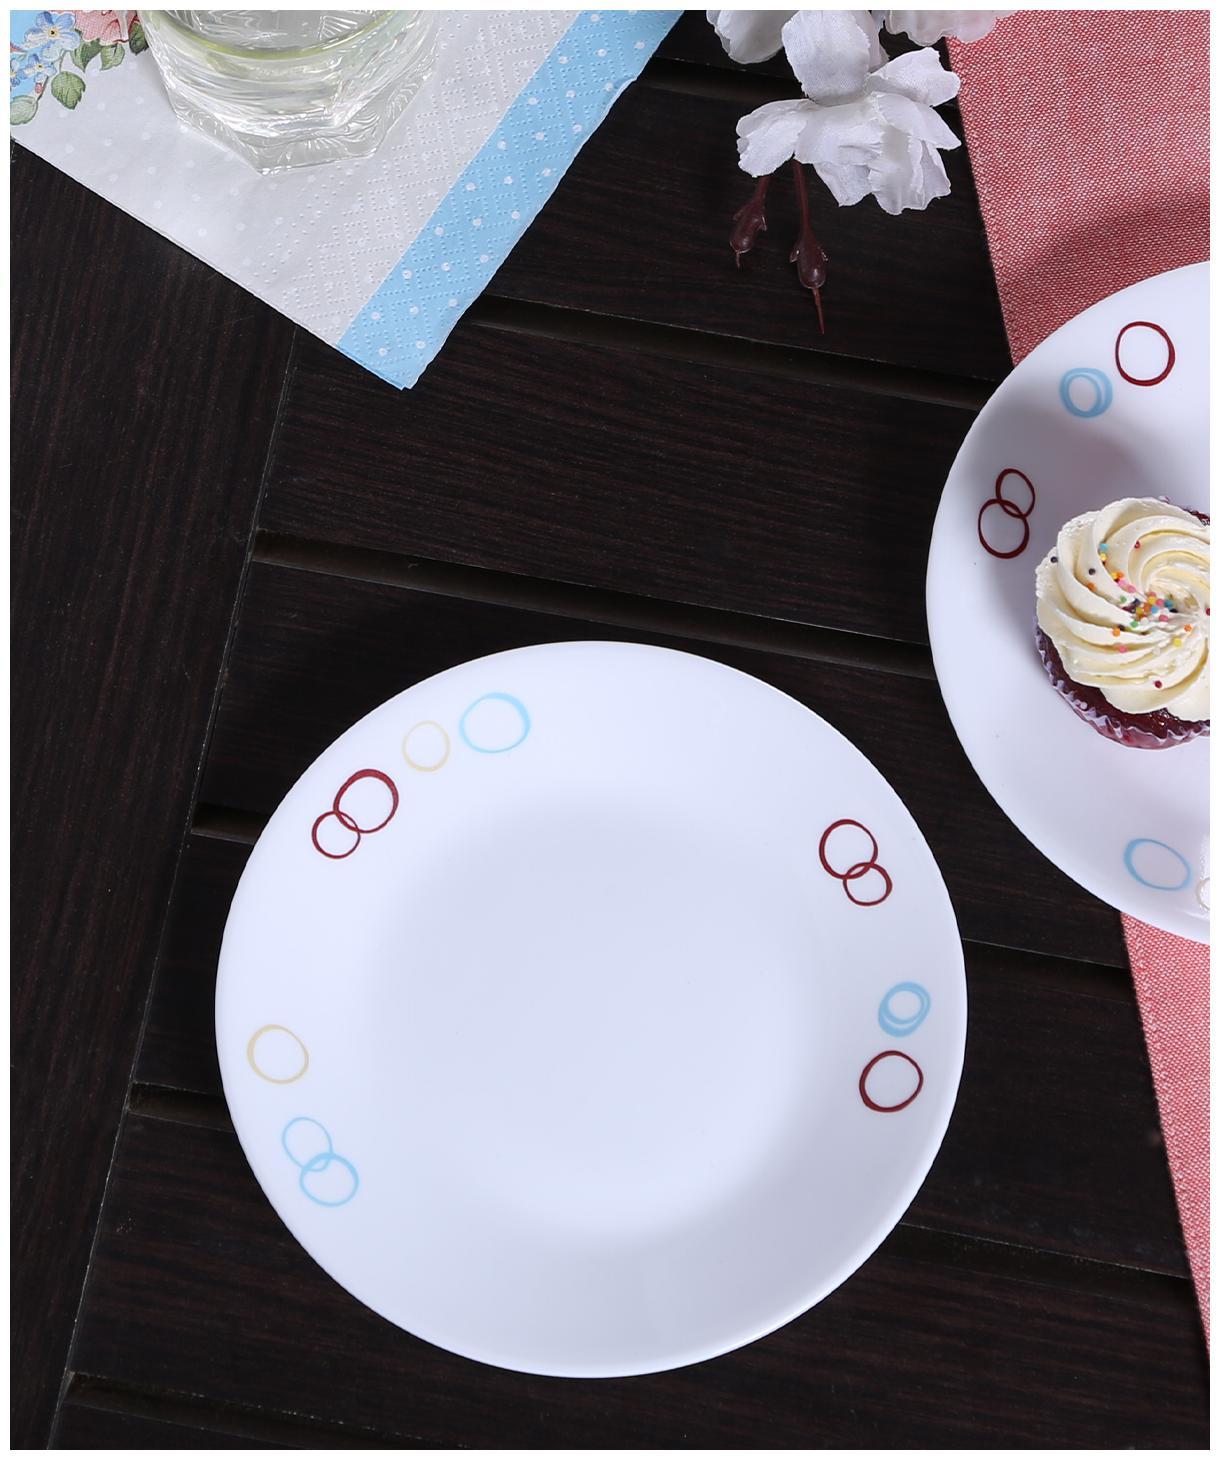 Corelle Livingware Circle 6 pcs Small Plates by Sheffield Classic